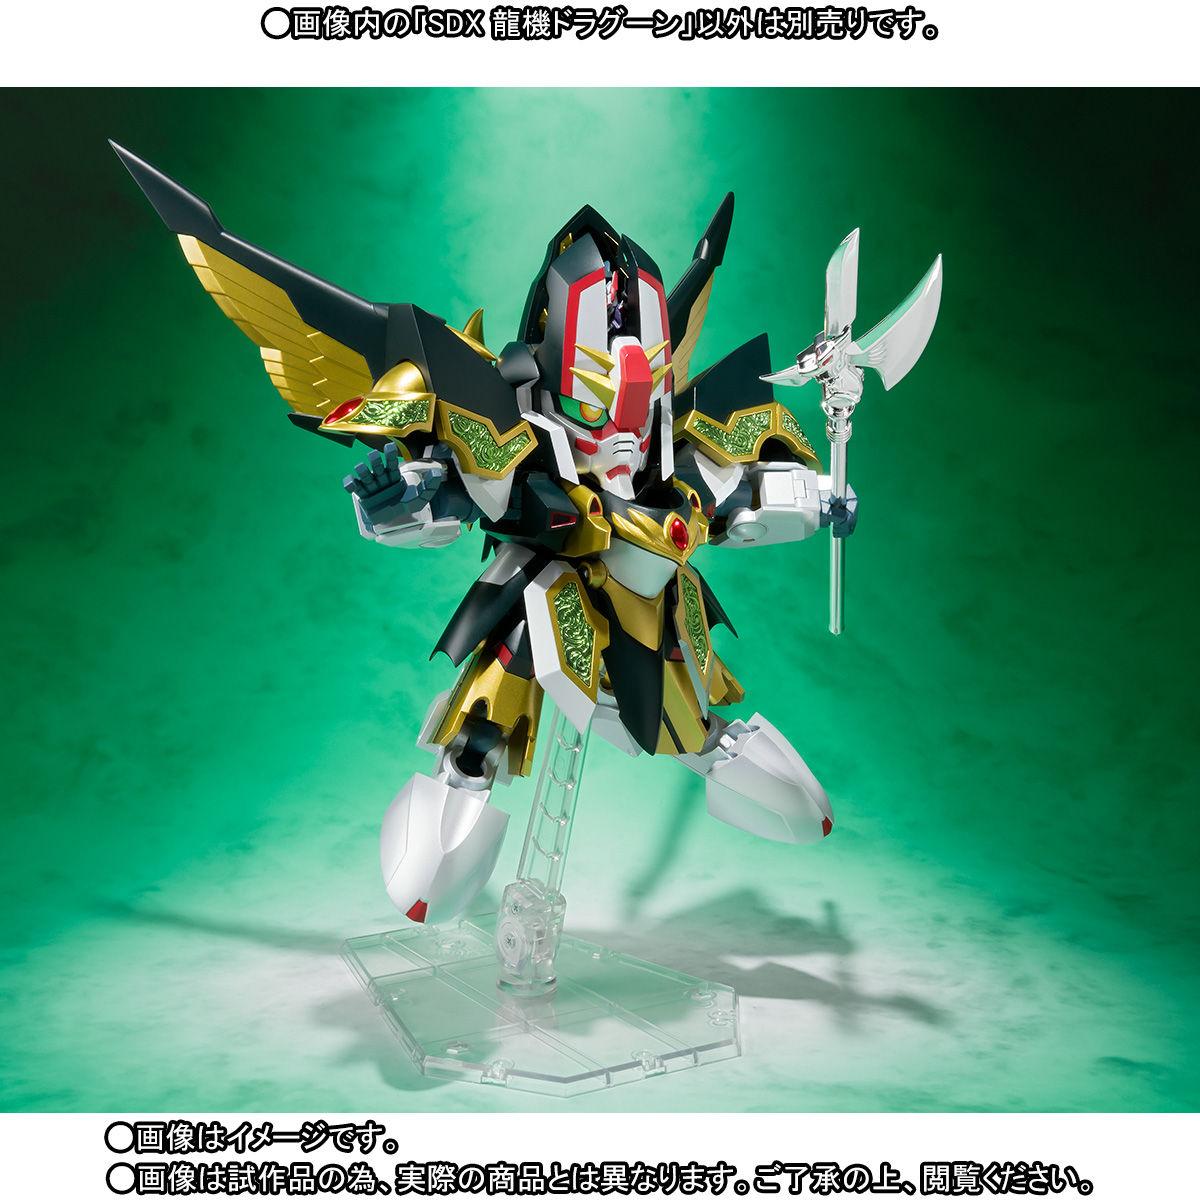 SDX『龍機ドラグーン 新SDガンダム外伝』可変可動フィギュア-003